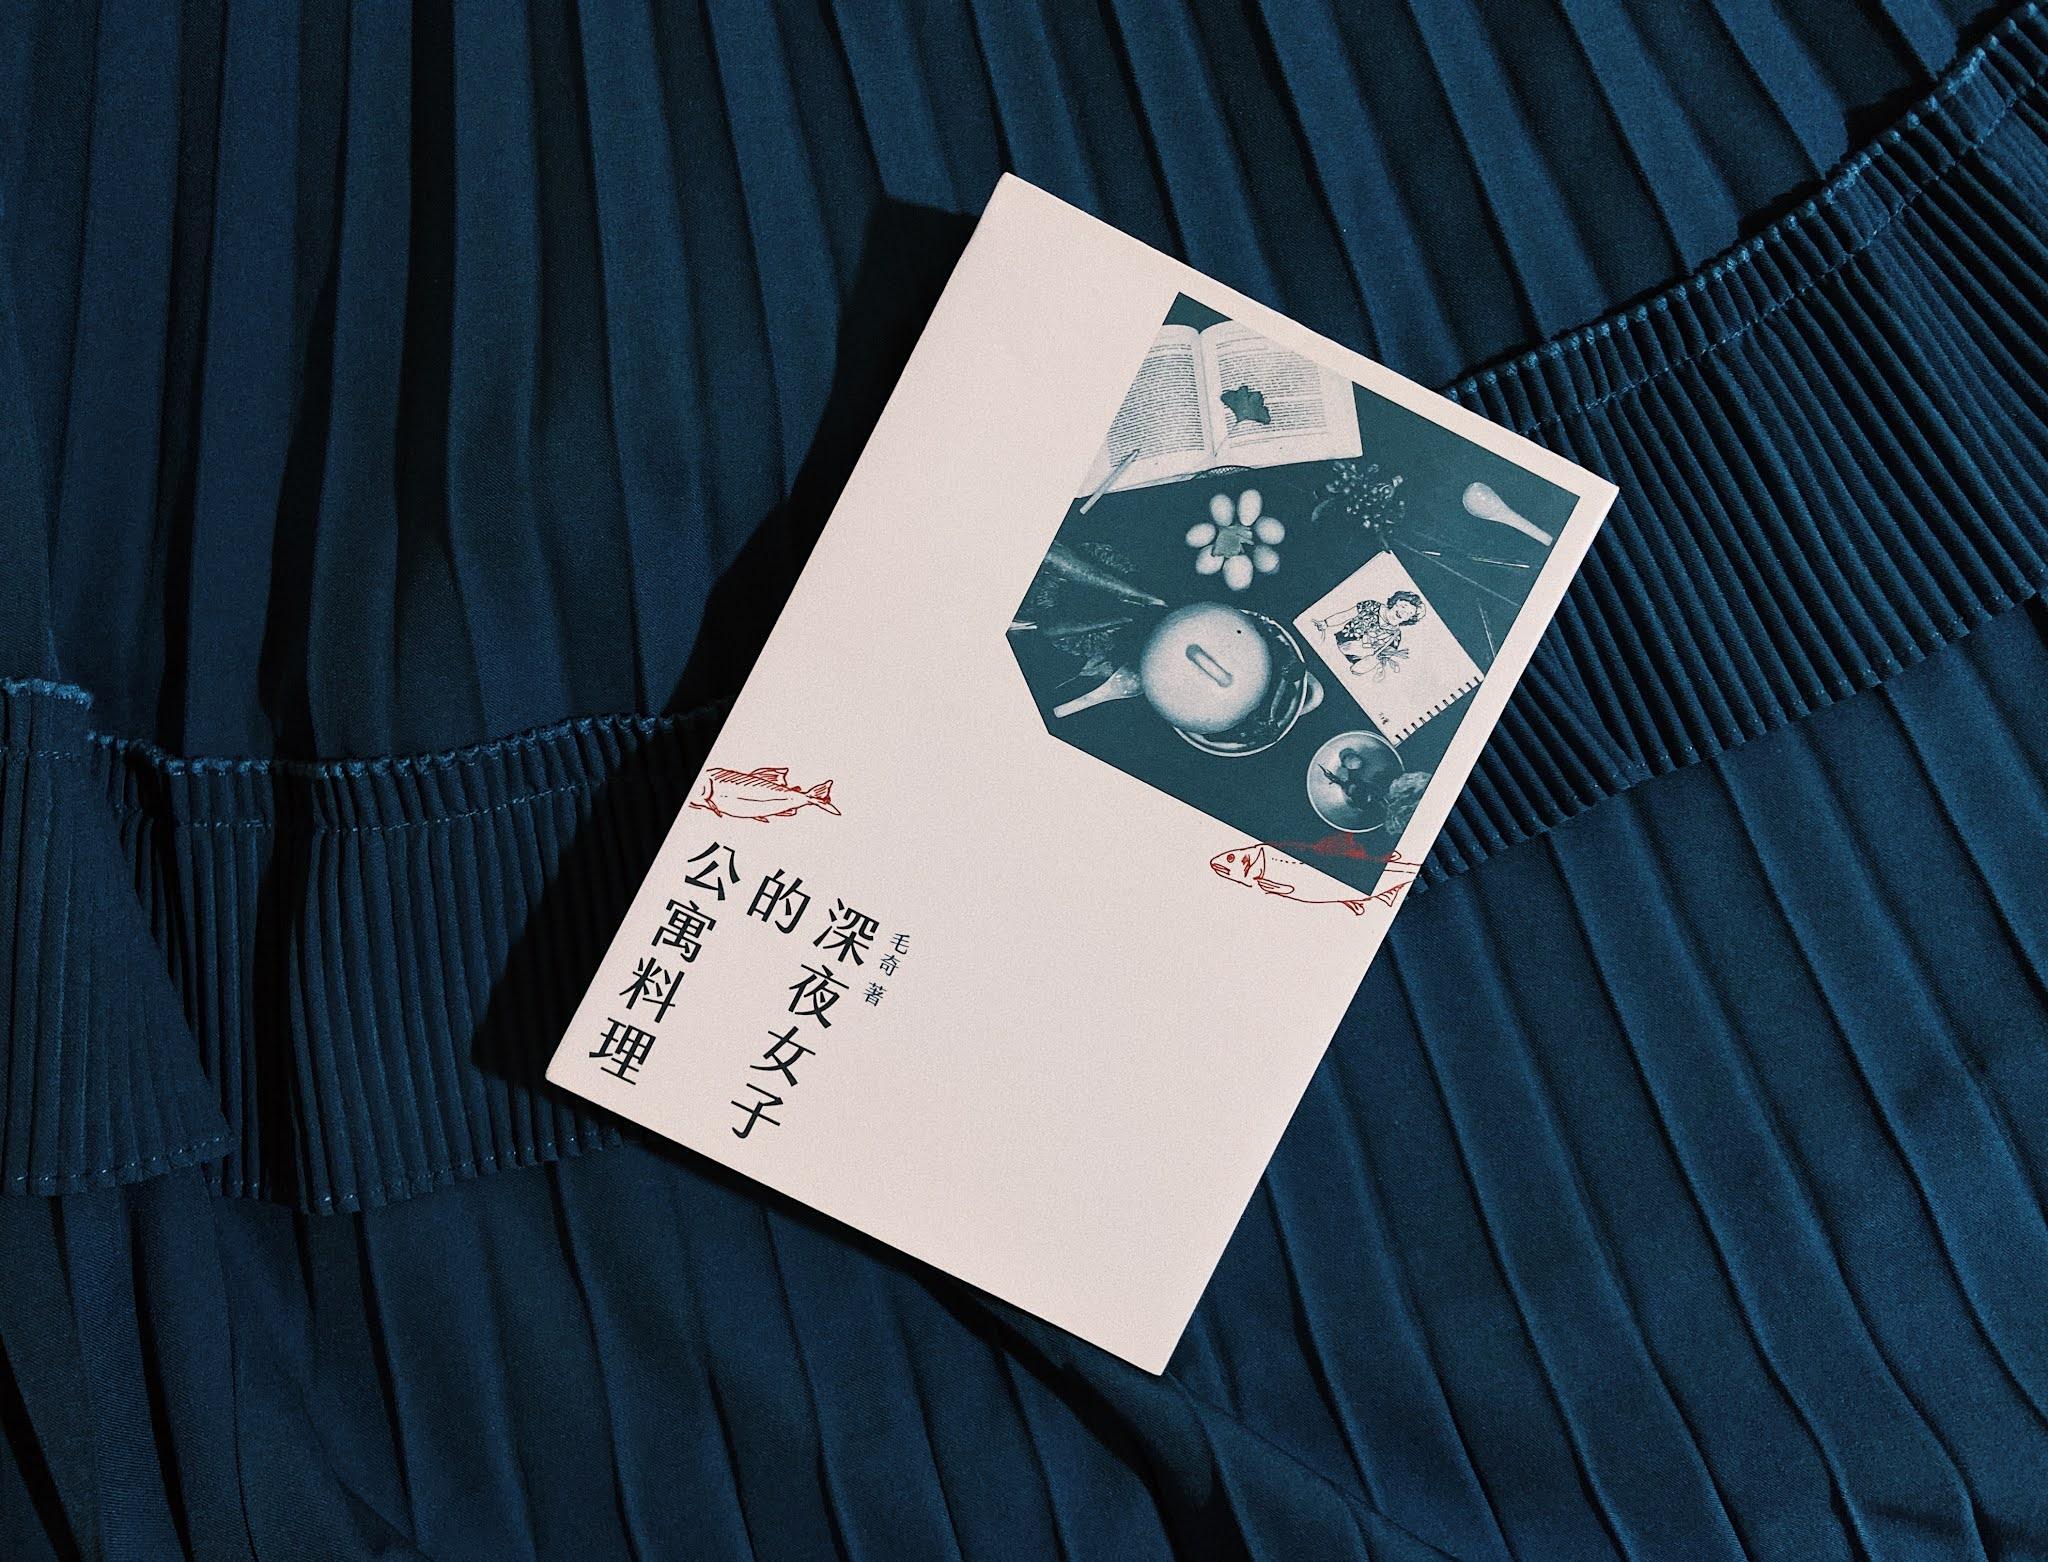 written by sophie: 人類只有一個任務:《深夜女子的公寓料理》